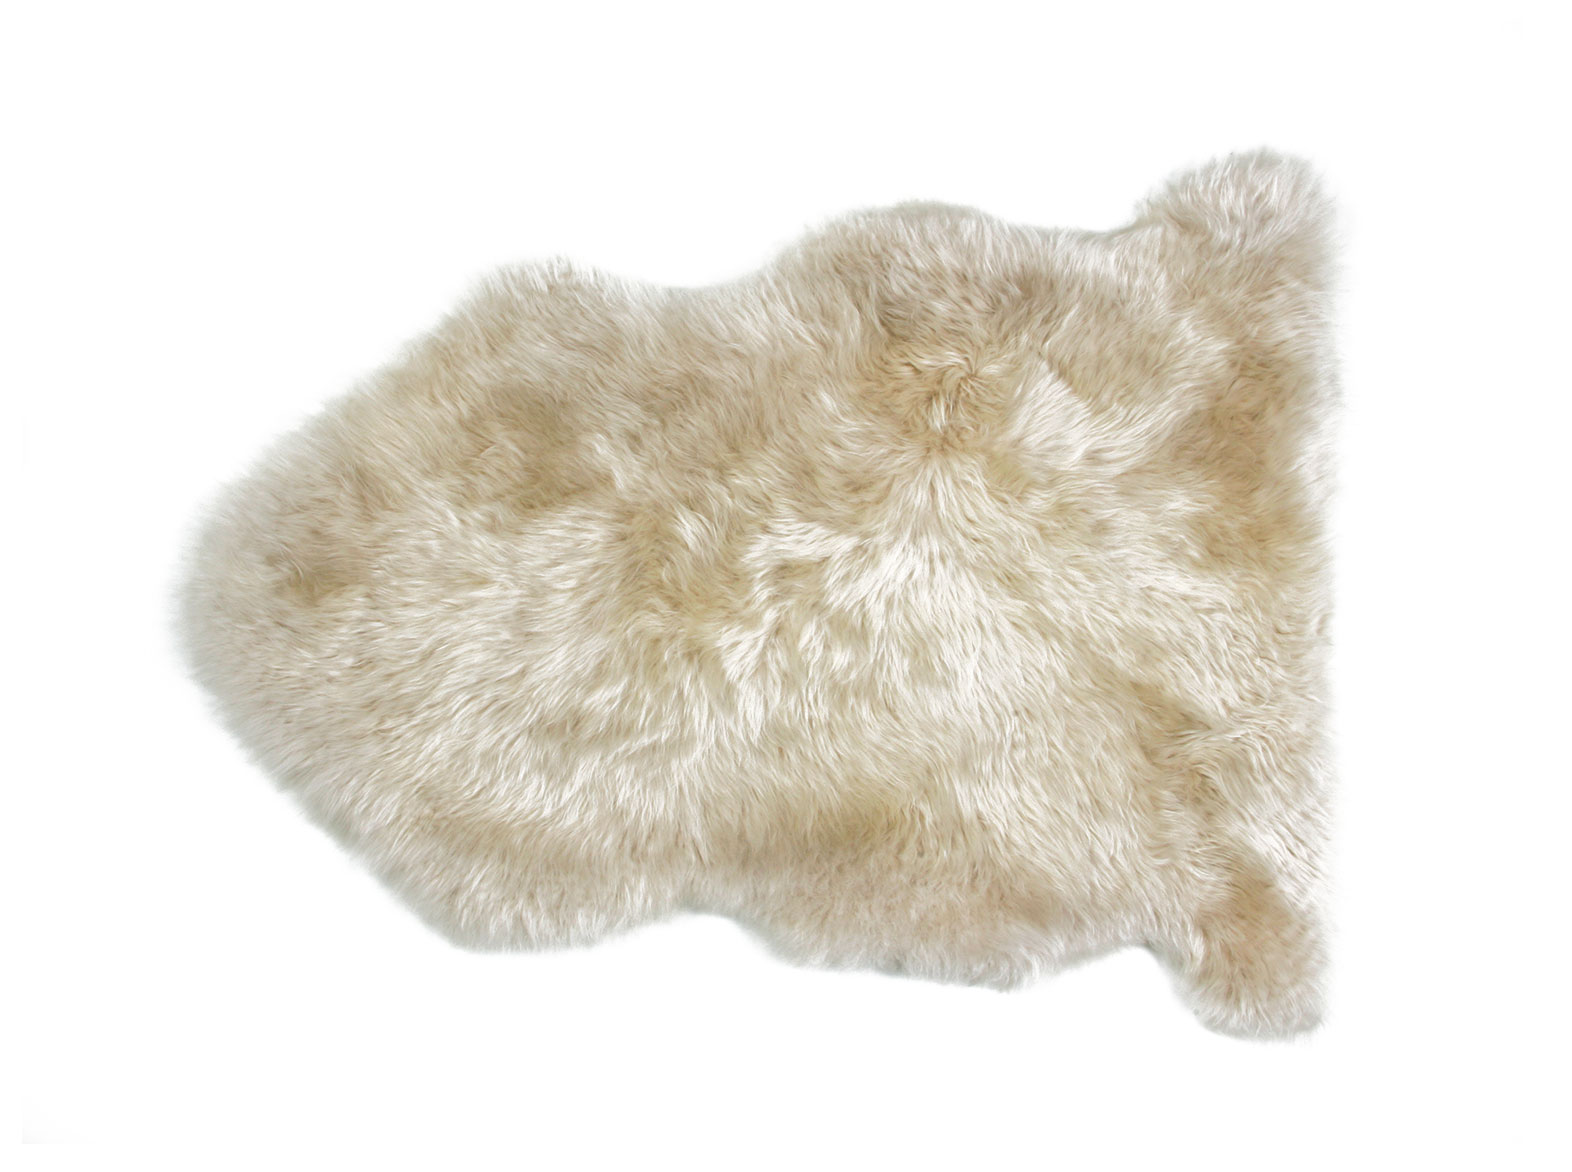 Linen Sheepskin Rug